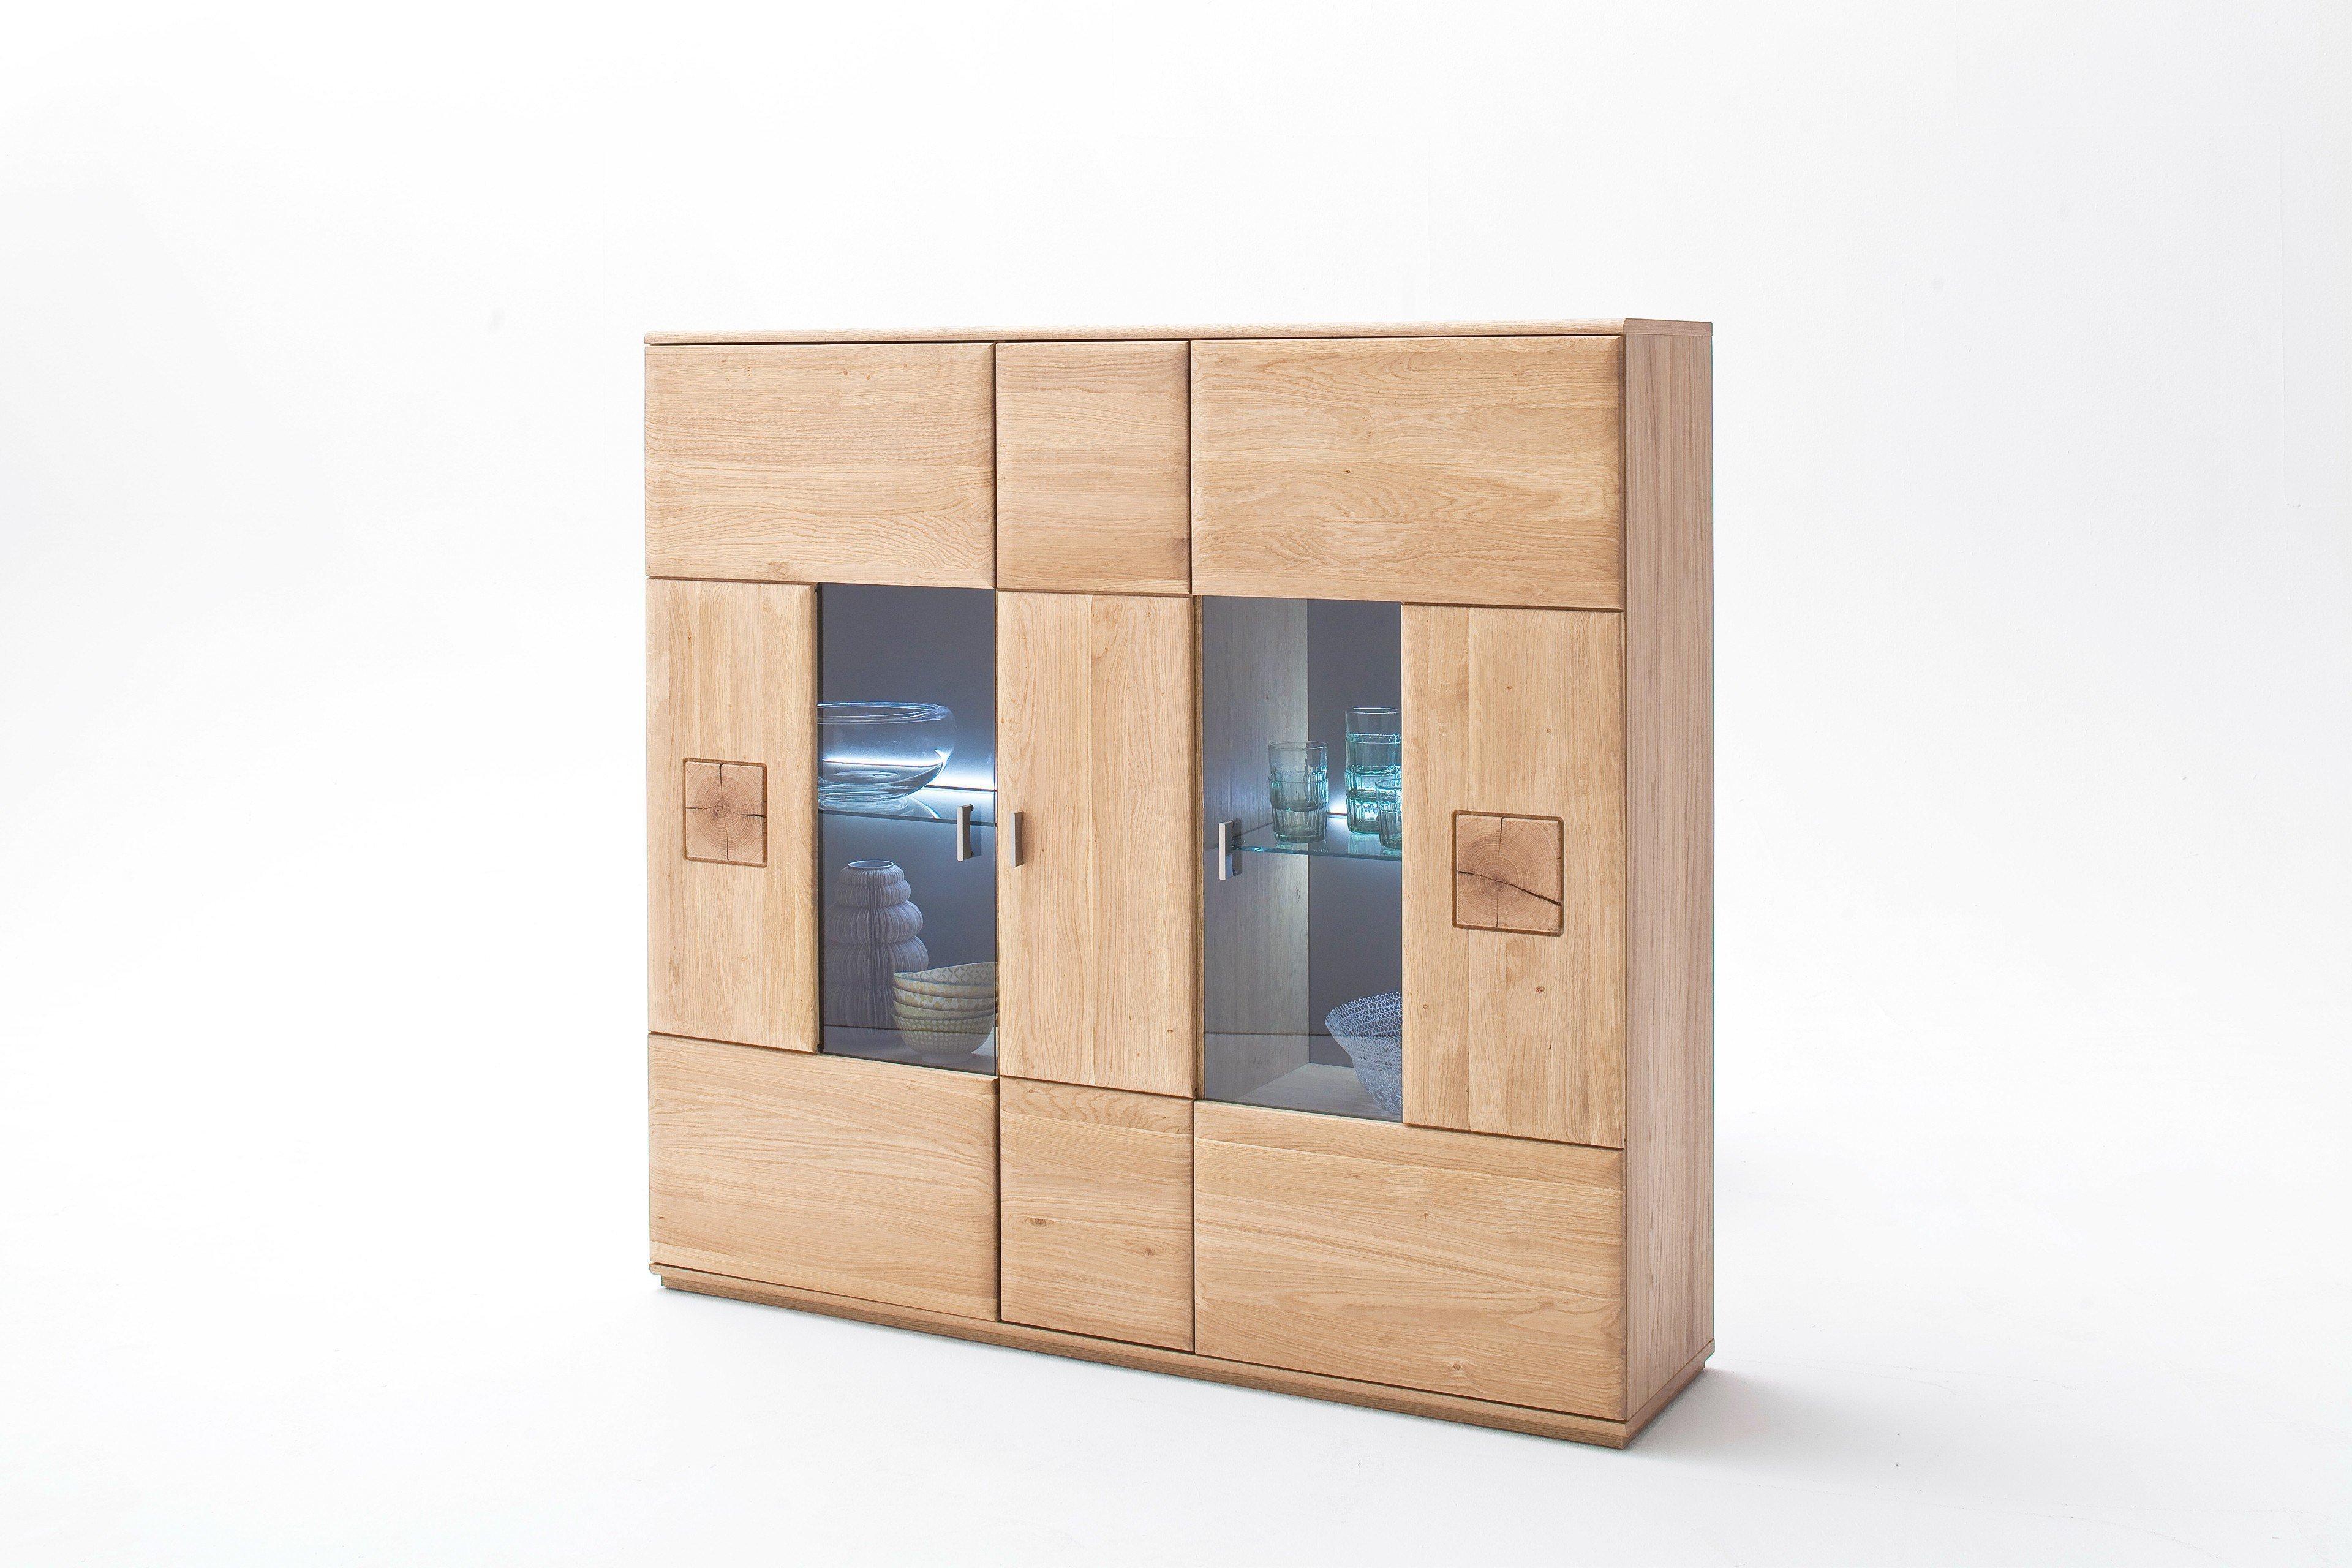 mca bologna highboard in eiche bianco m bel letz ihr online shop. Black Bedroom Furniture Sets. Home Design Ideas